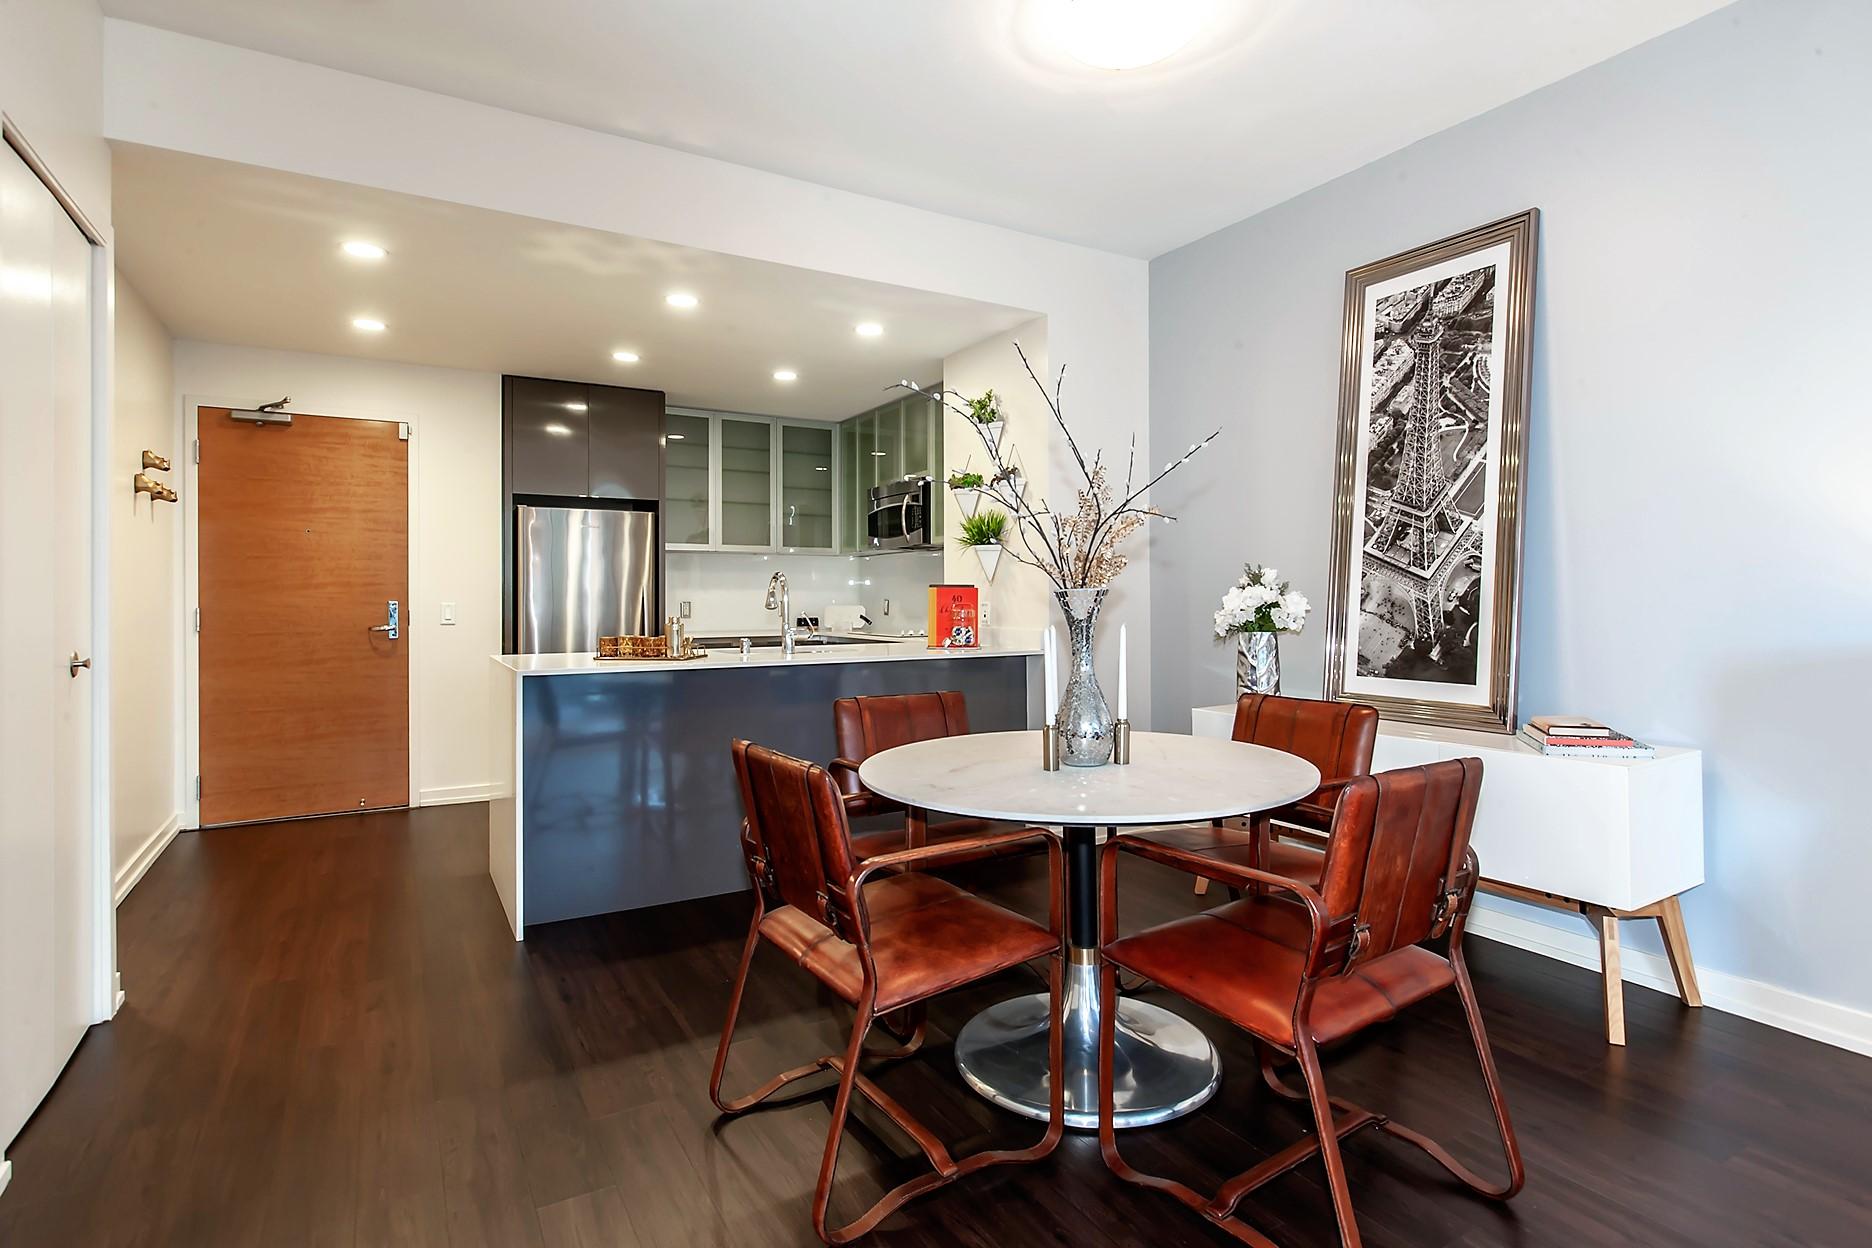 Kitchen diner at Argenta Apartment, Hayes Valley, San Francisco